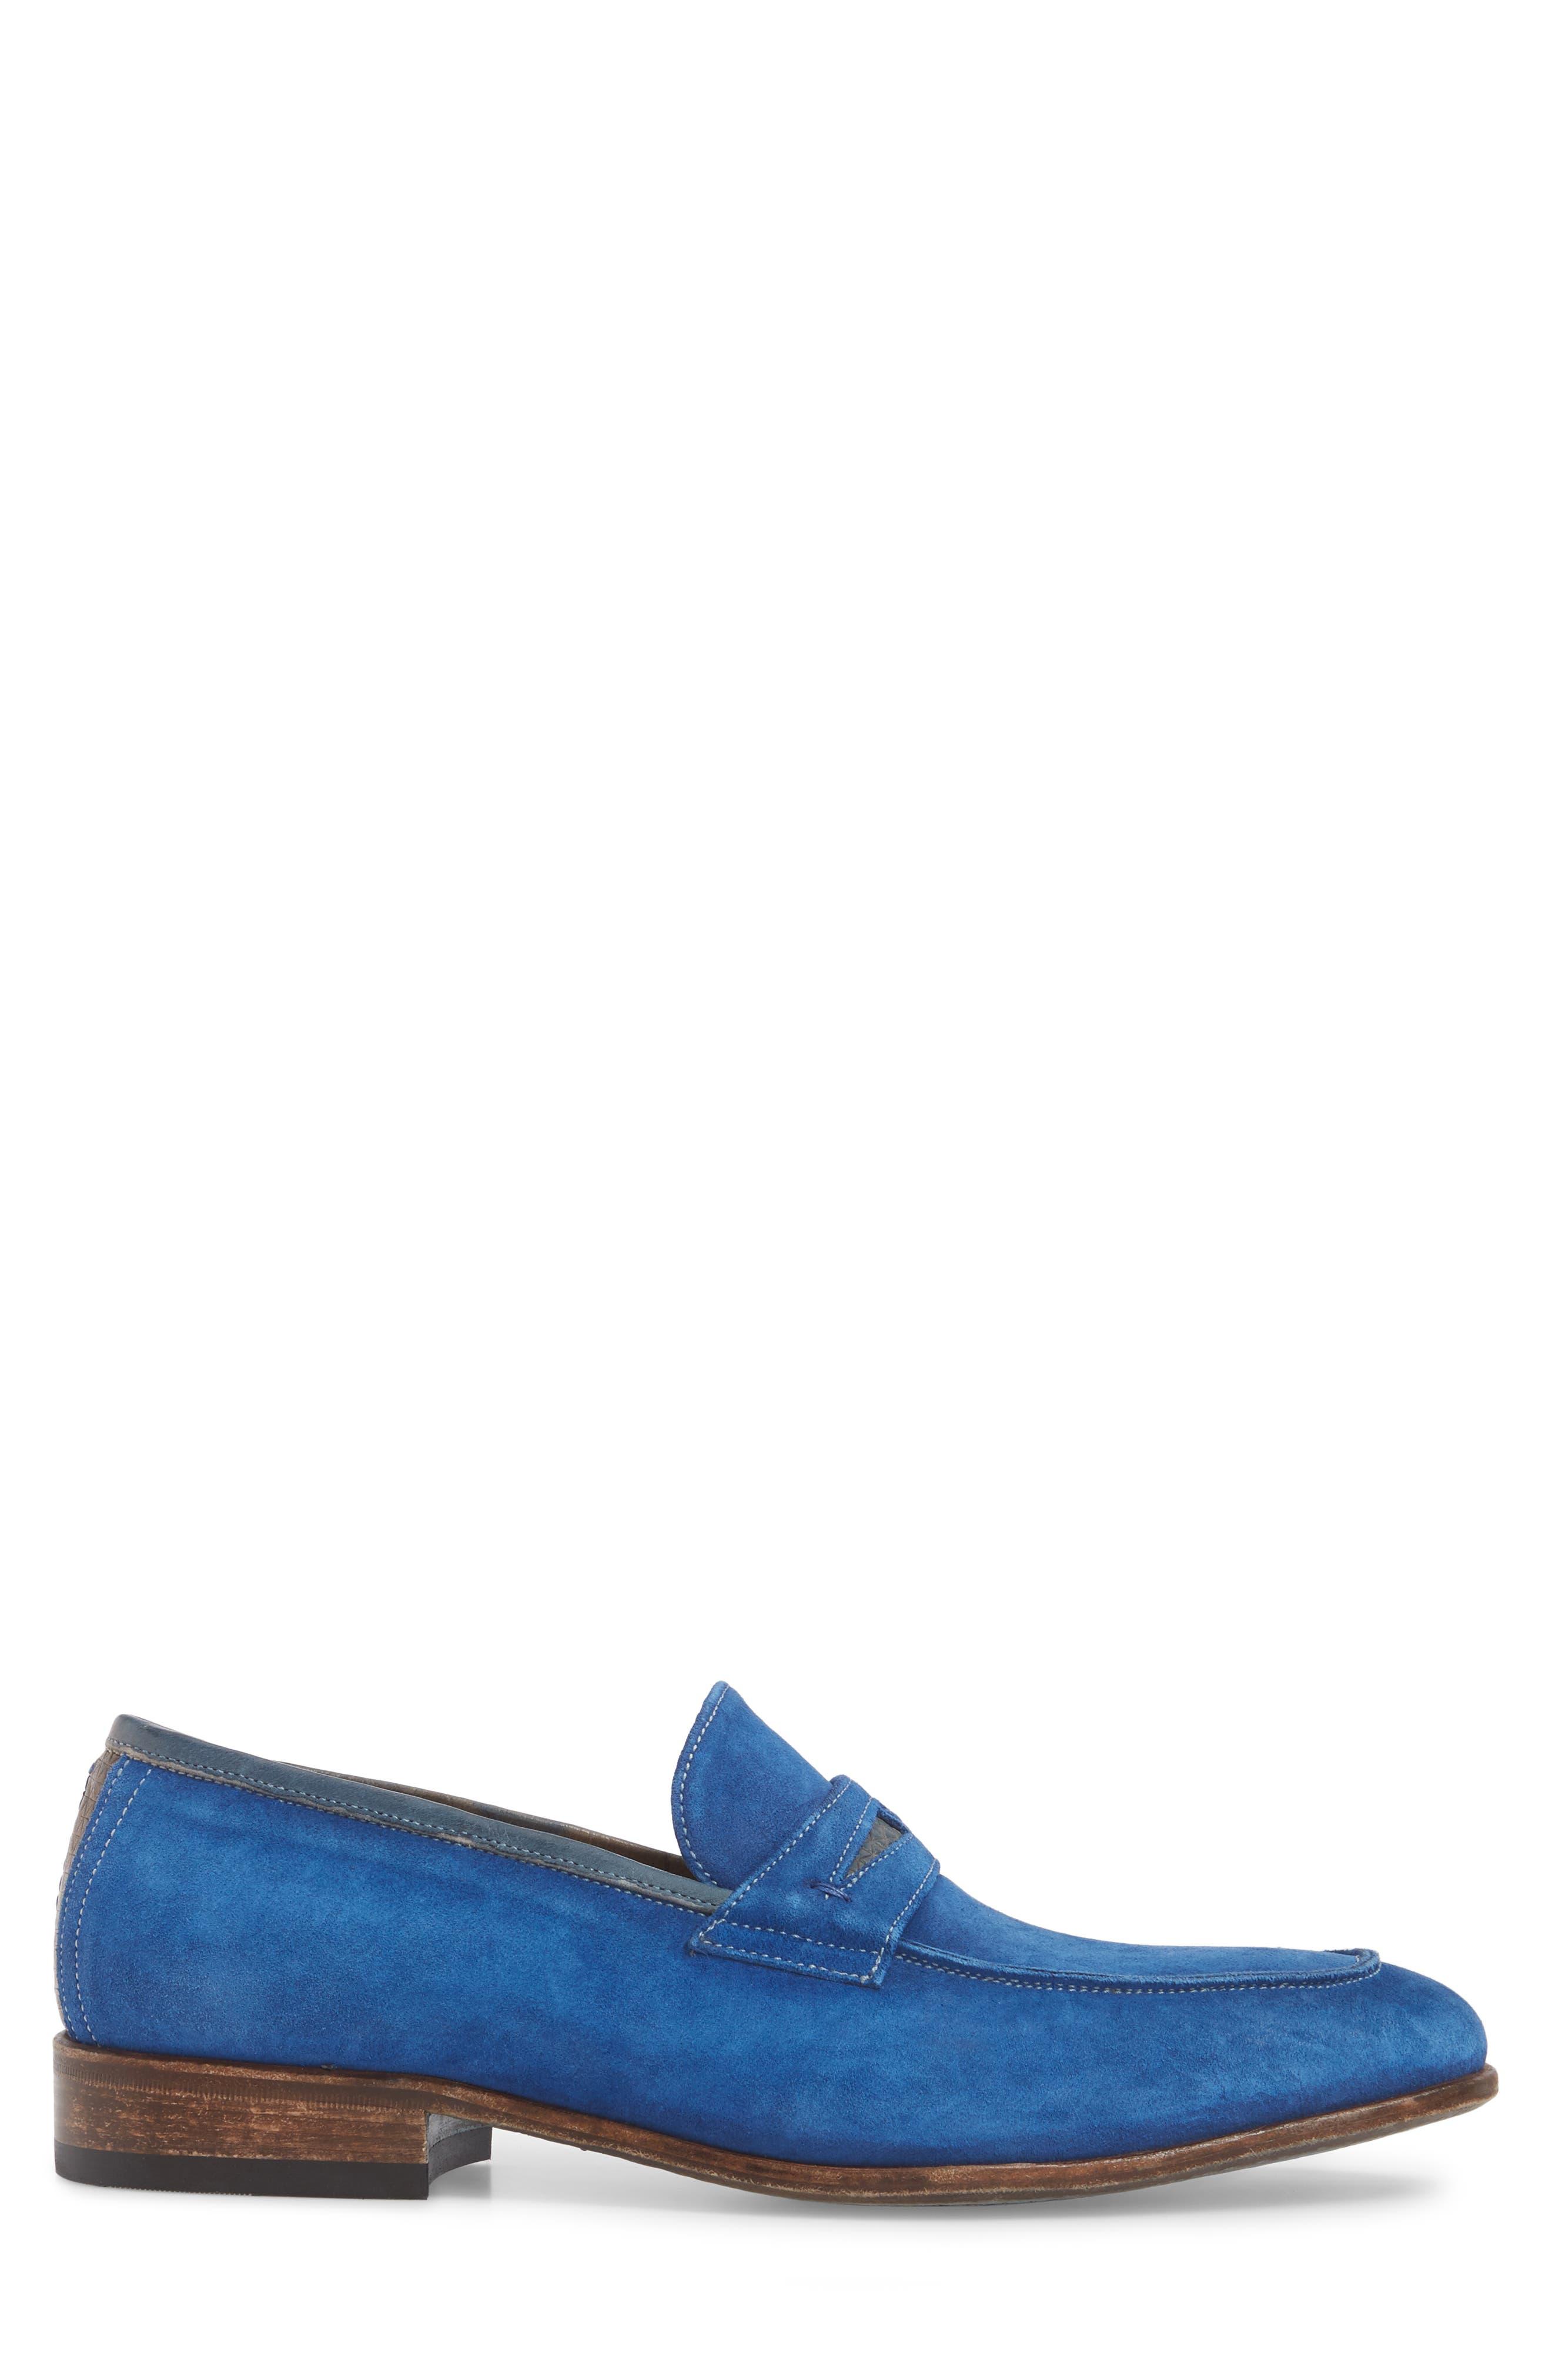 Lex Apron Toe Penny Loafer,                             Alternate thumbnail 3, color,                             Blue Suede